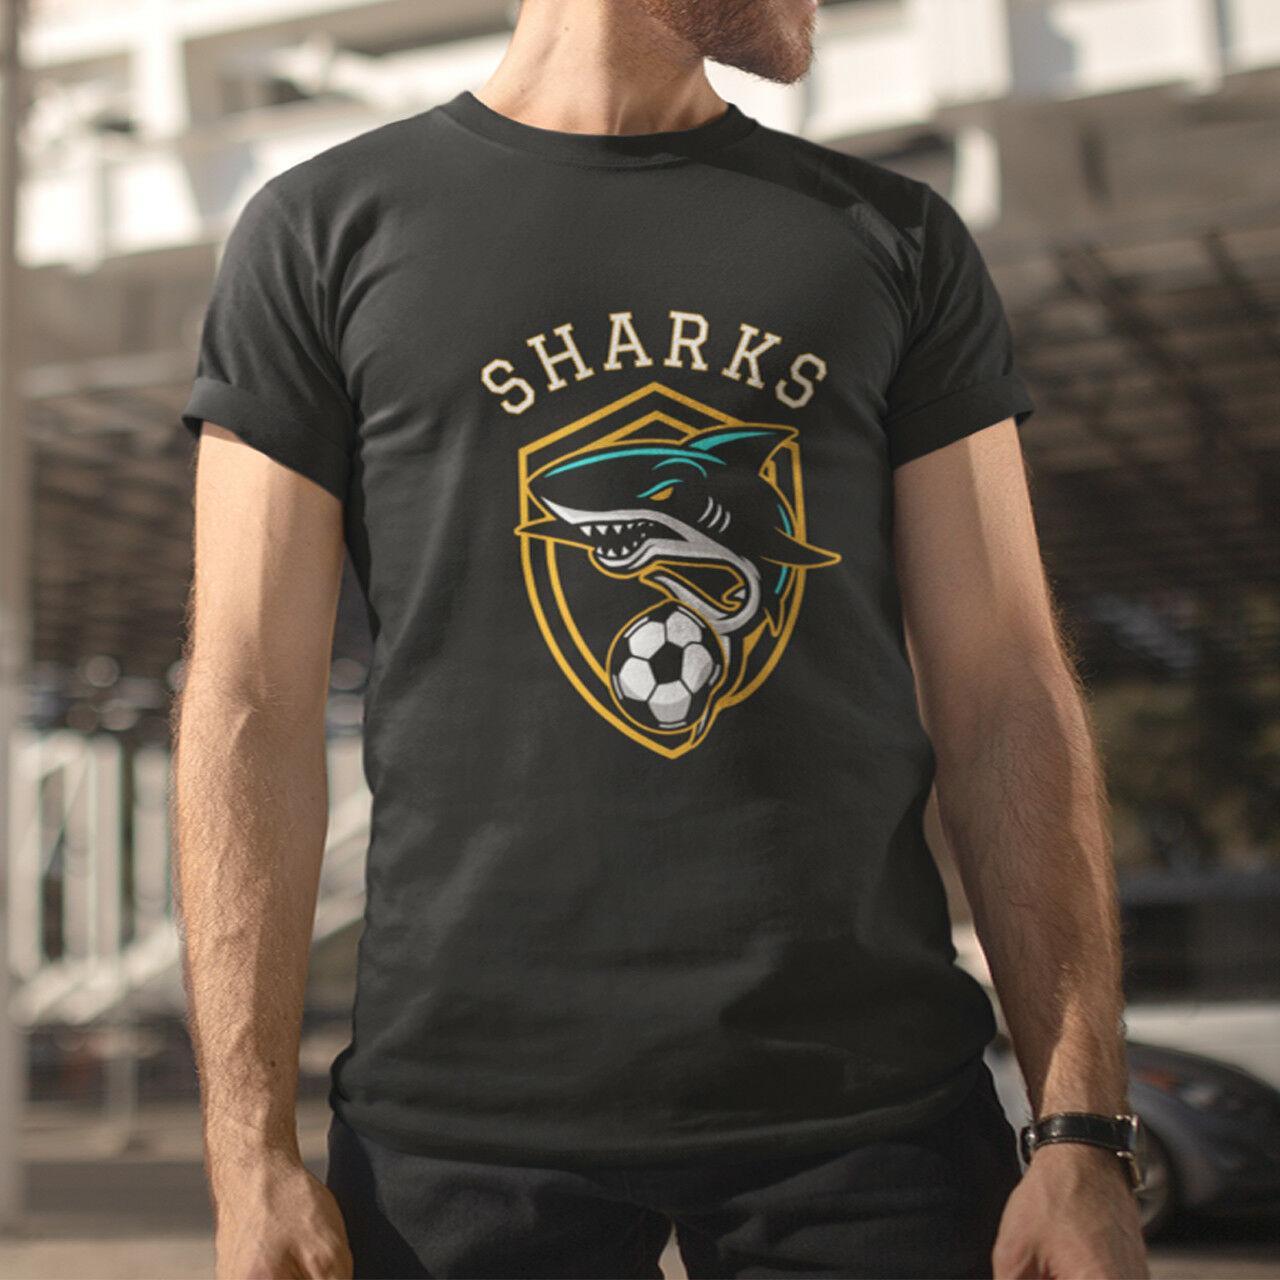 f80de35a T Shirt Designs For Soccer Teams   Top Mode Depot